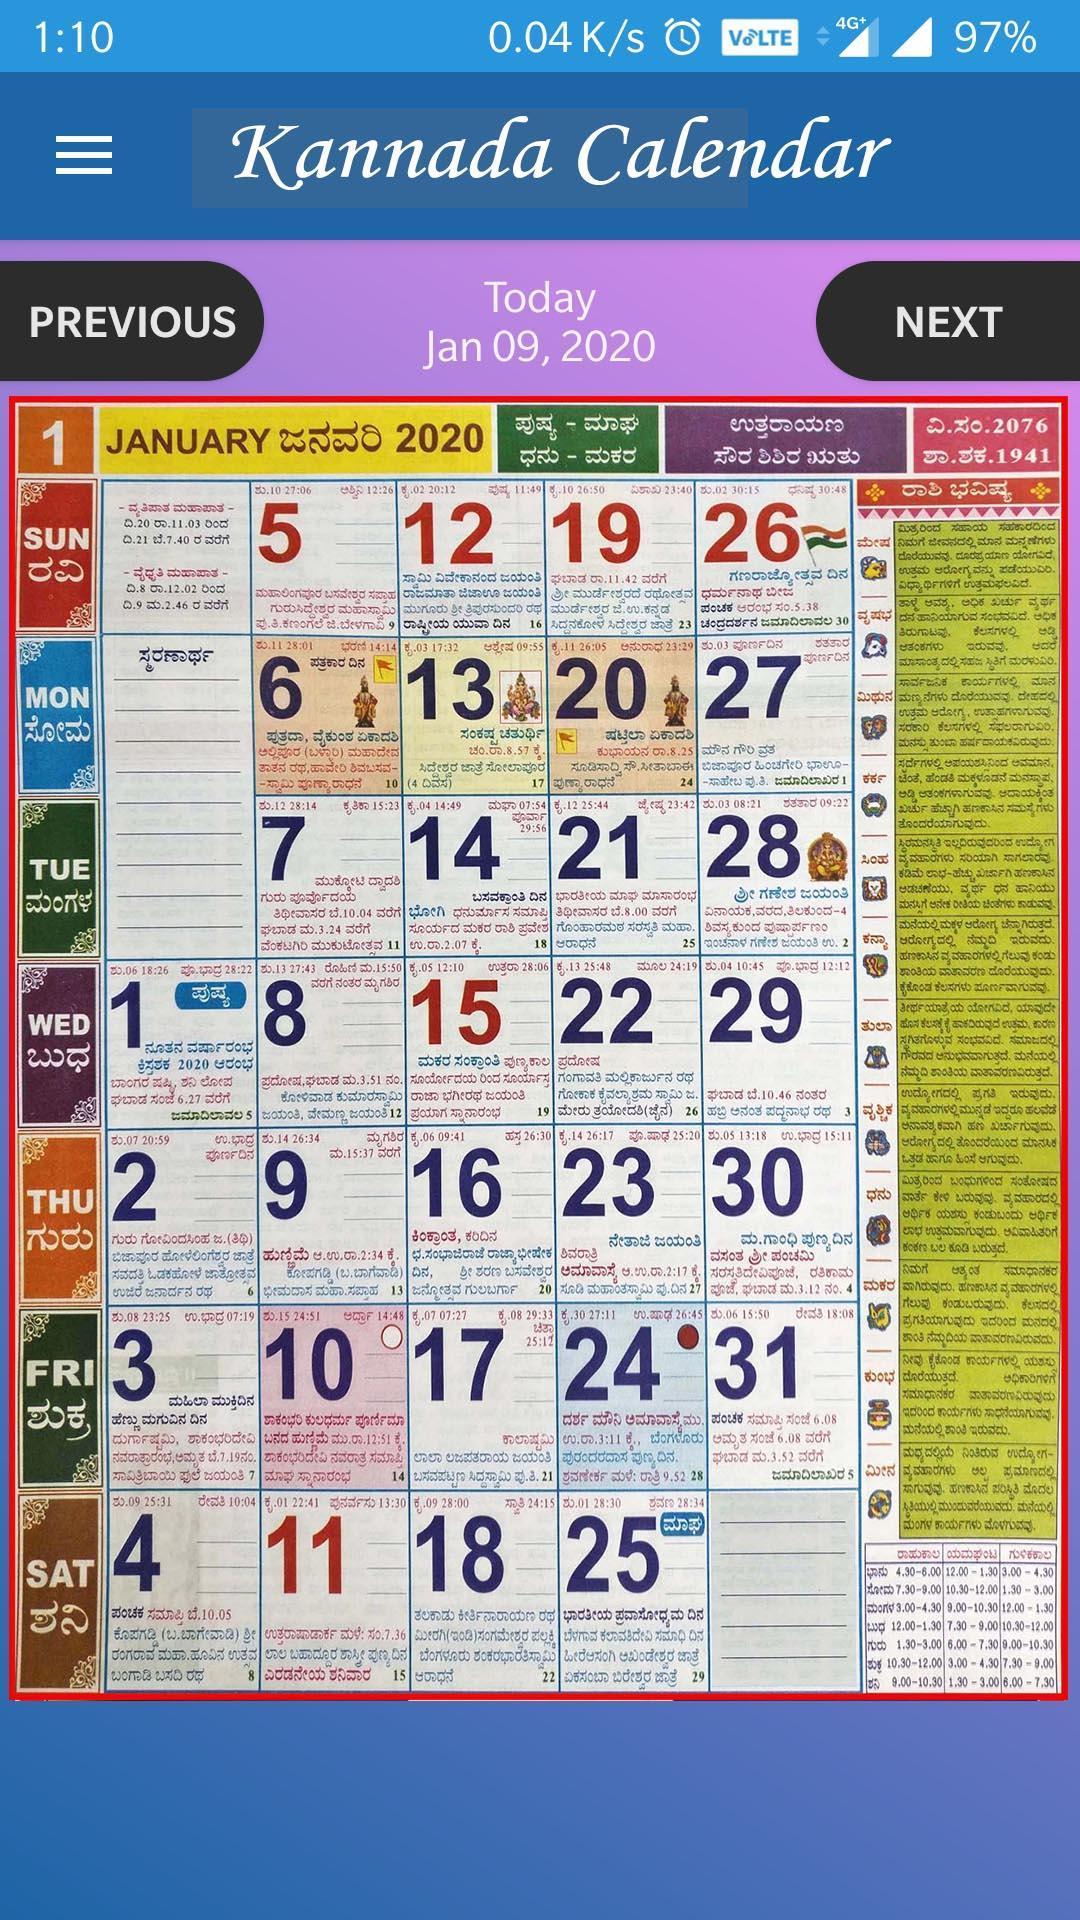 Kannada Calendar For Android - Apk Download